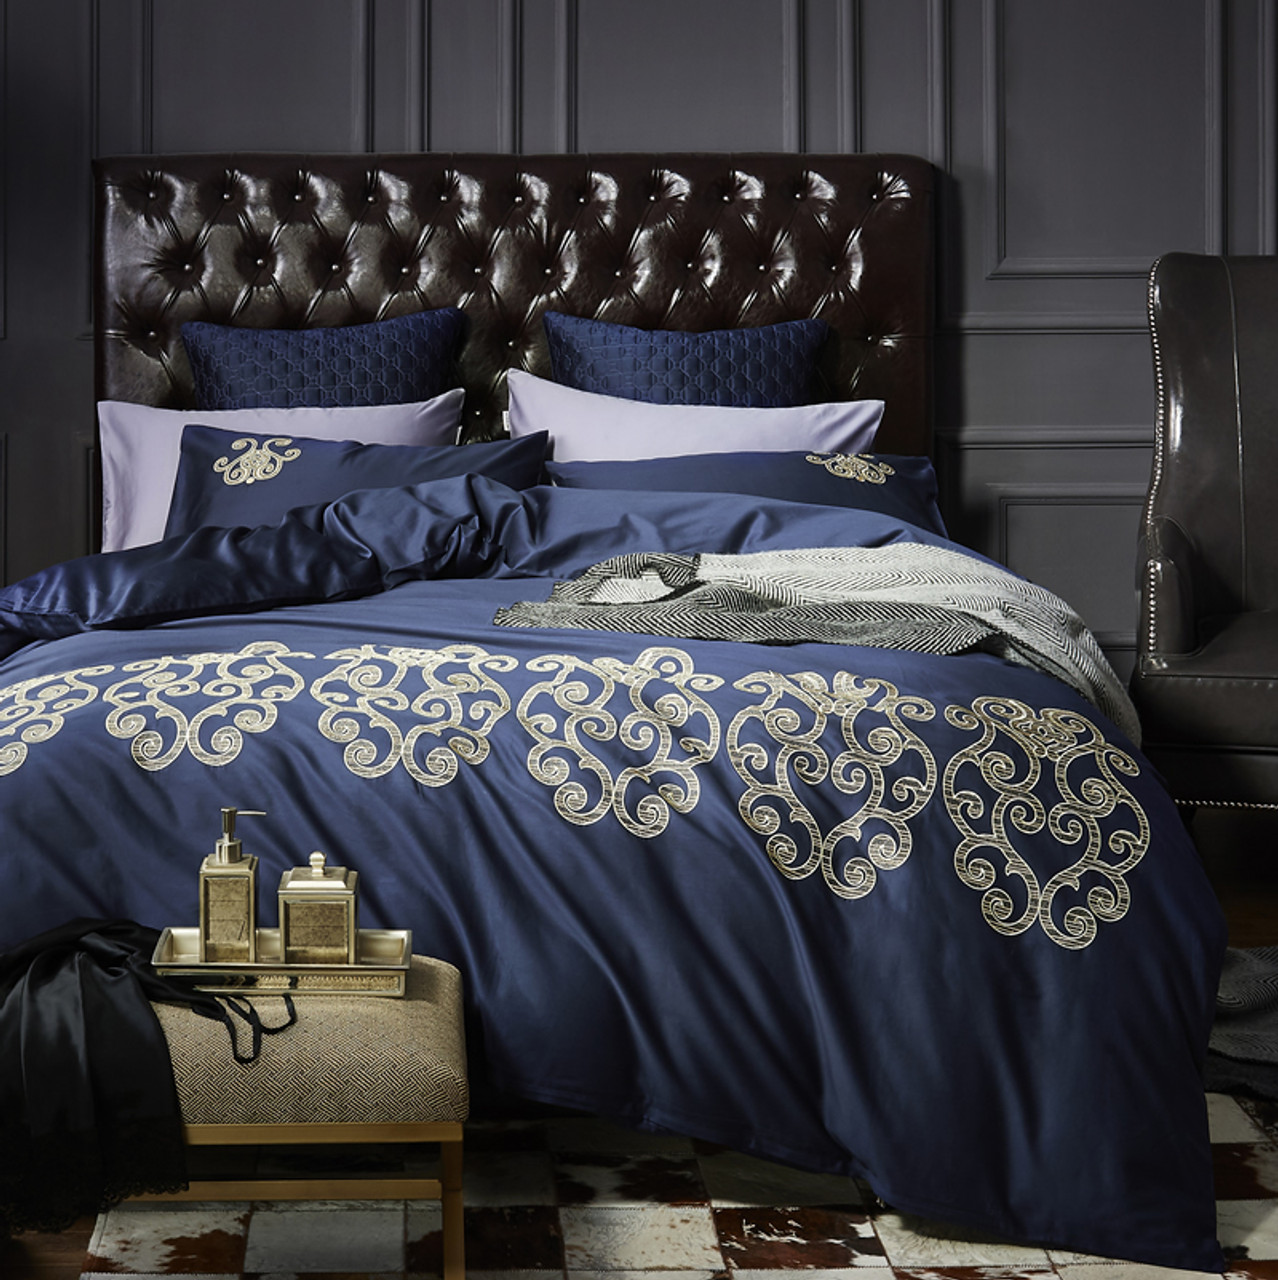 4pcs 100 cotton black white silver luxury bedding sets bedclothes king queen size duvet cover bed sheet linens set pillowcases